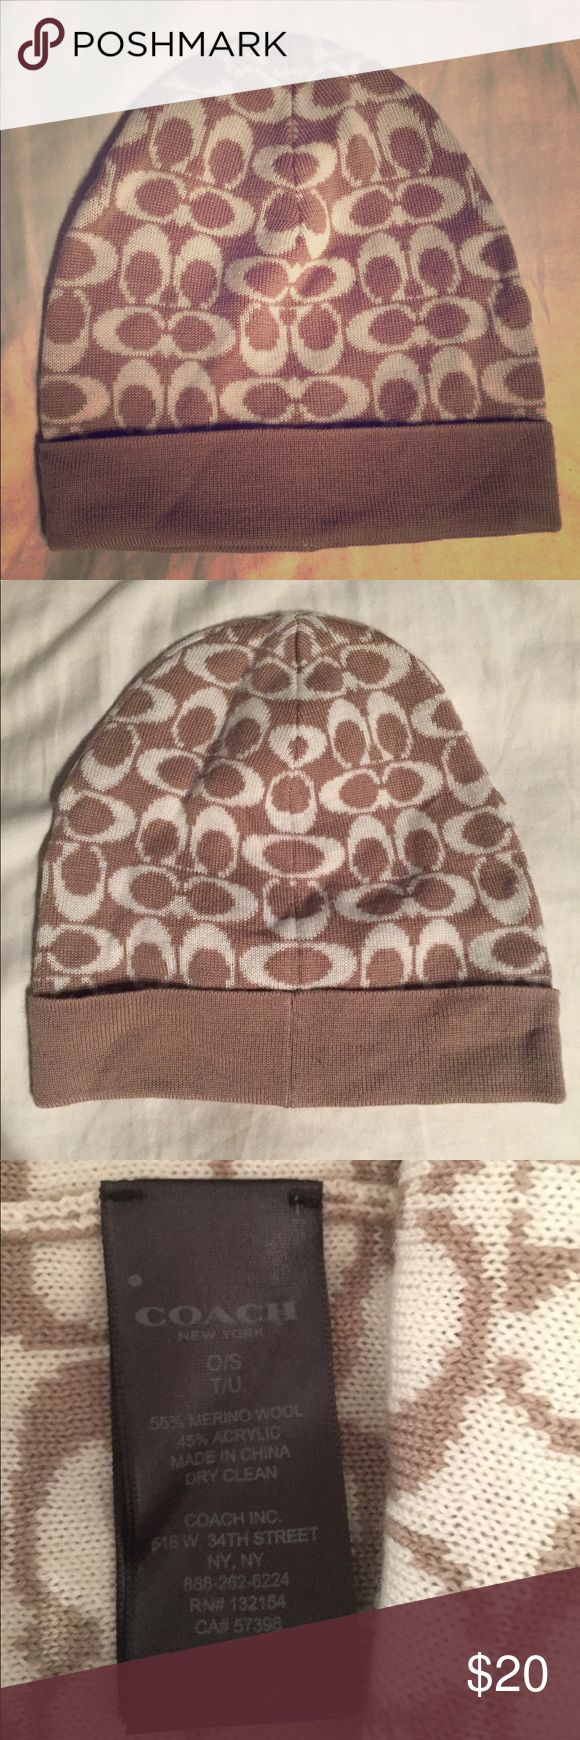 Authentic Knit Coach Hat Vintage beige Coach hat with signature white C logo. Never worn! Coach Accessories Hats